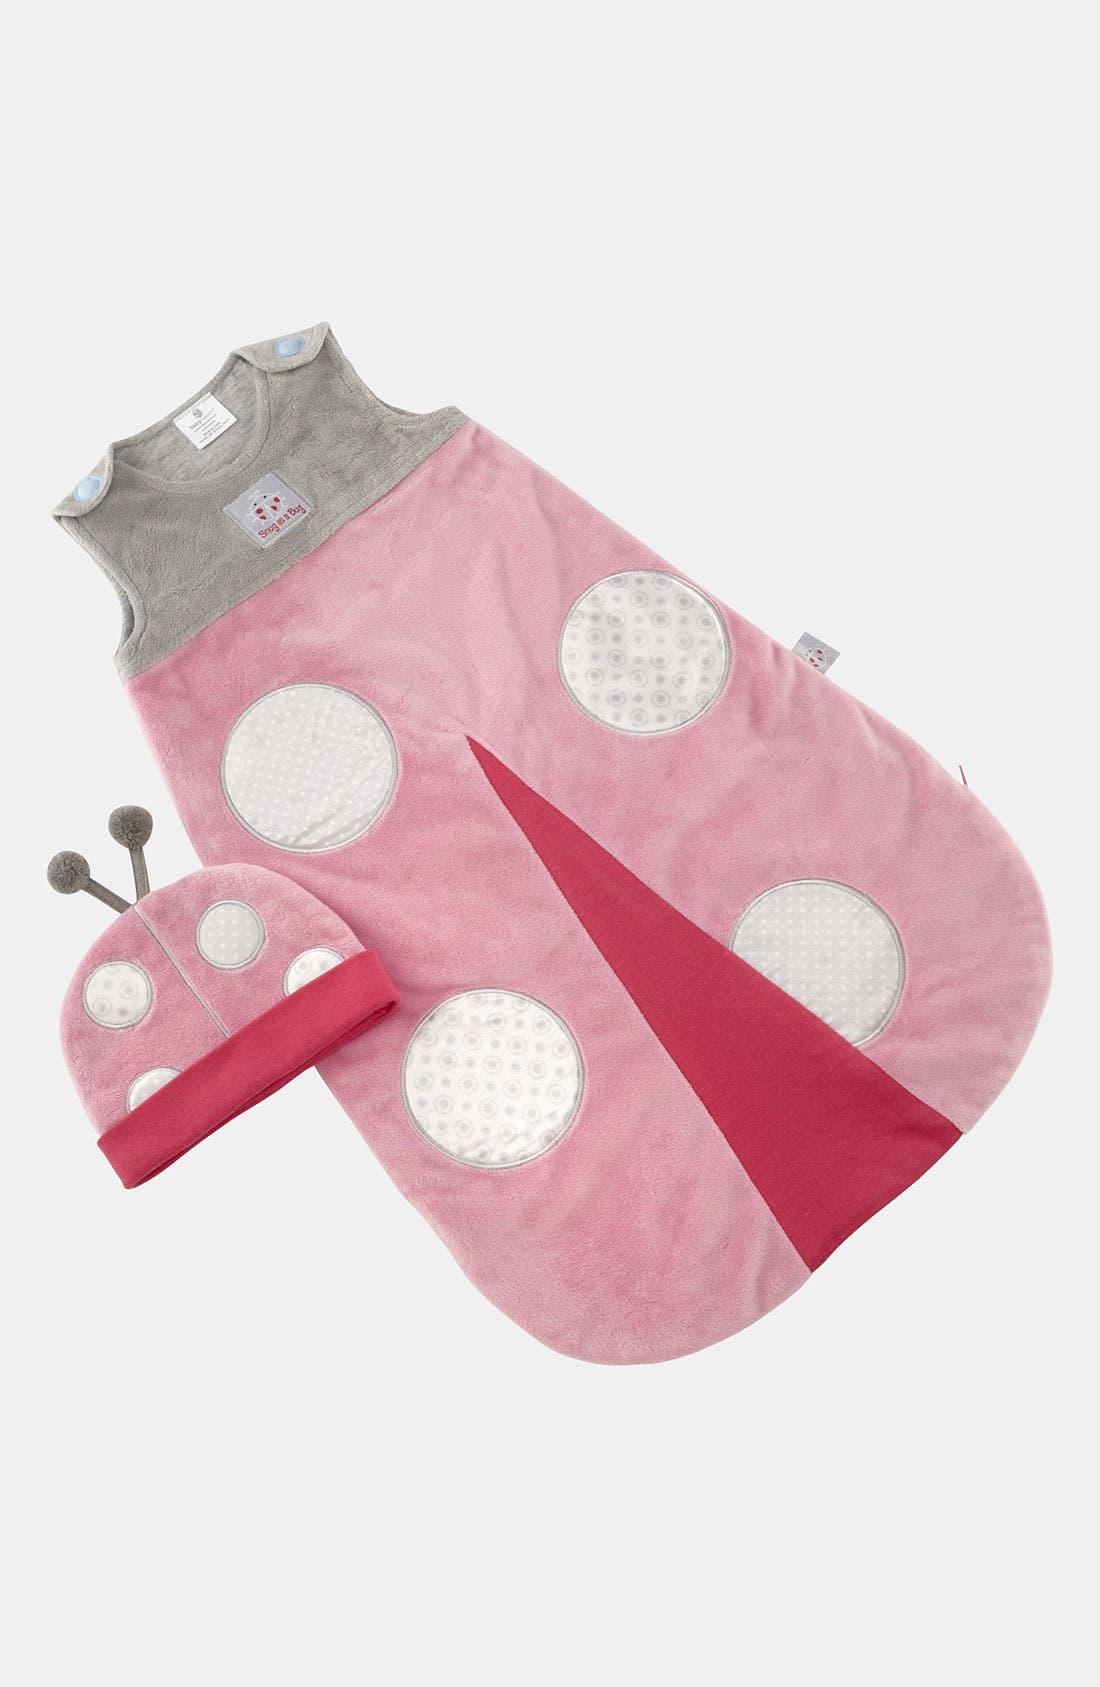 Main Image - Baby Aspen 'Snug as a Bug' Wearable Blanket & Hat (Baby)